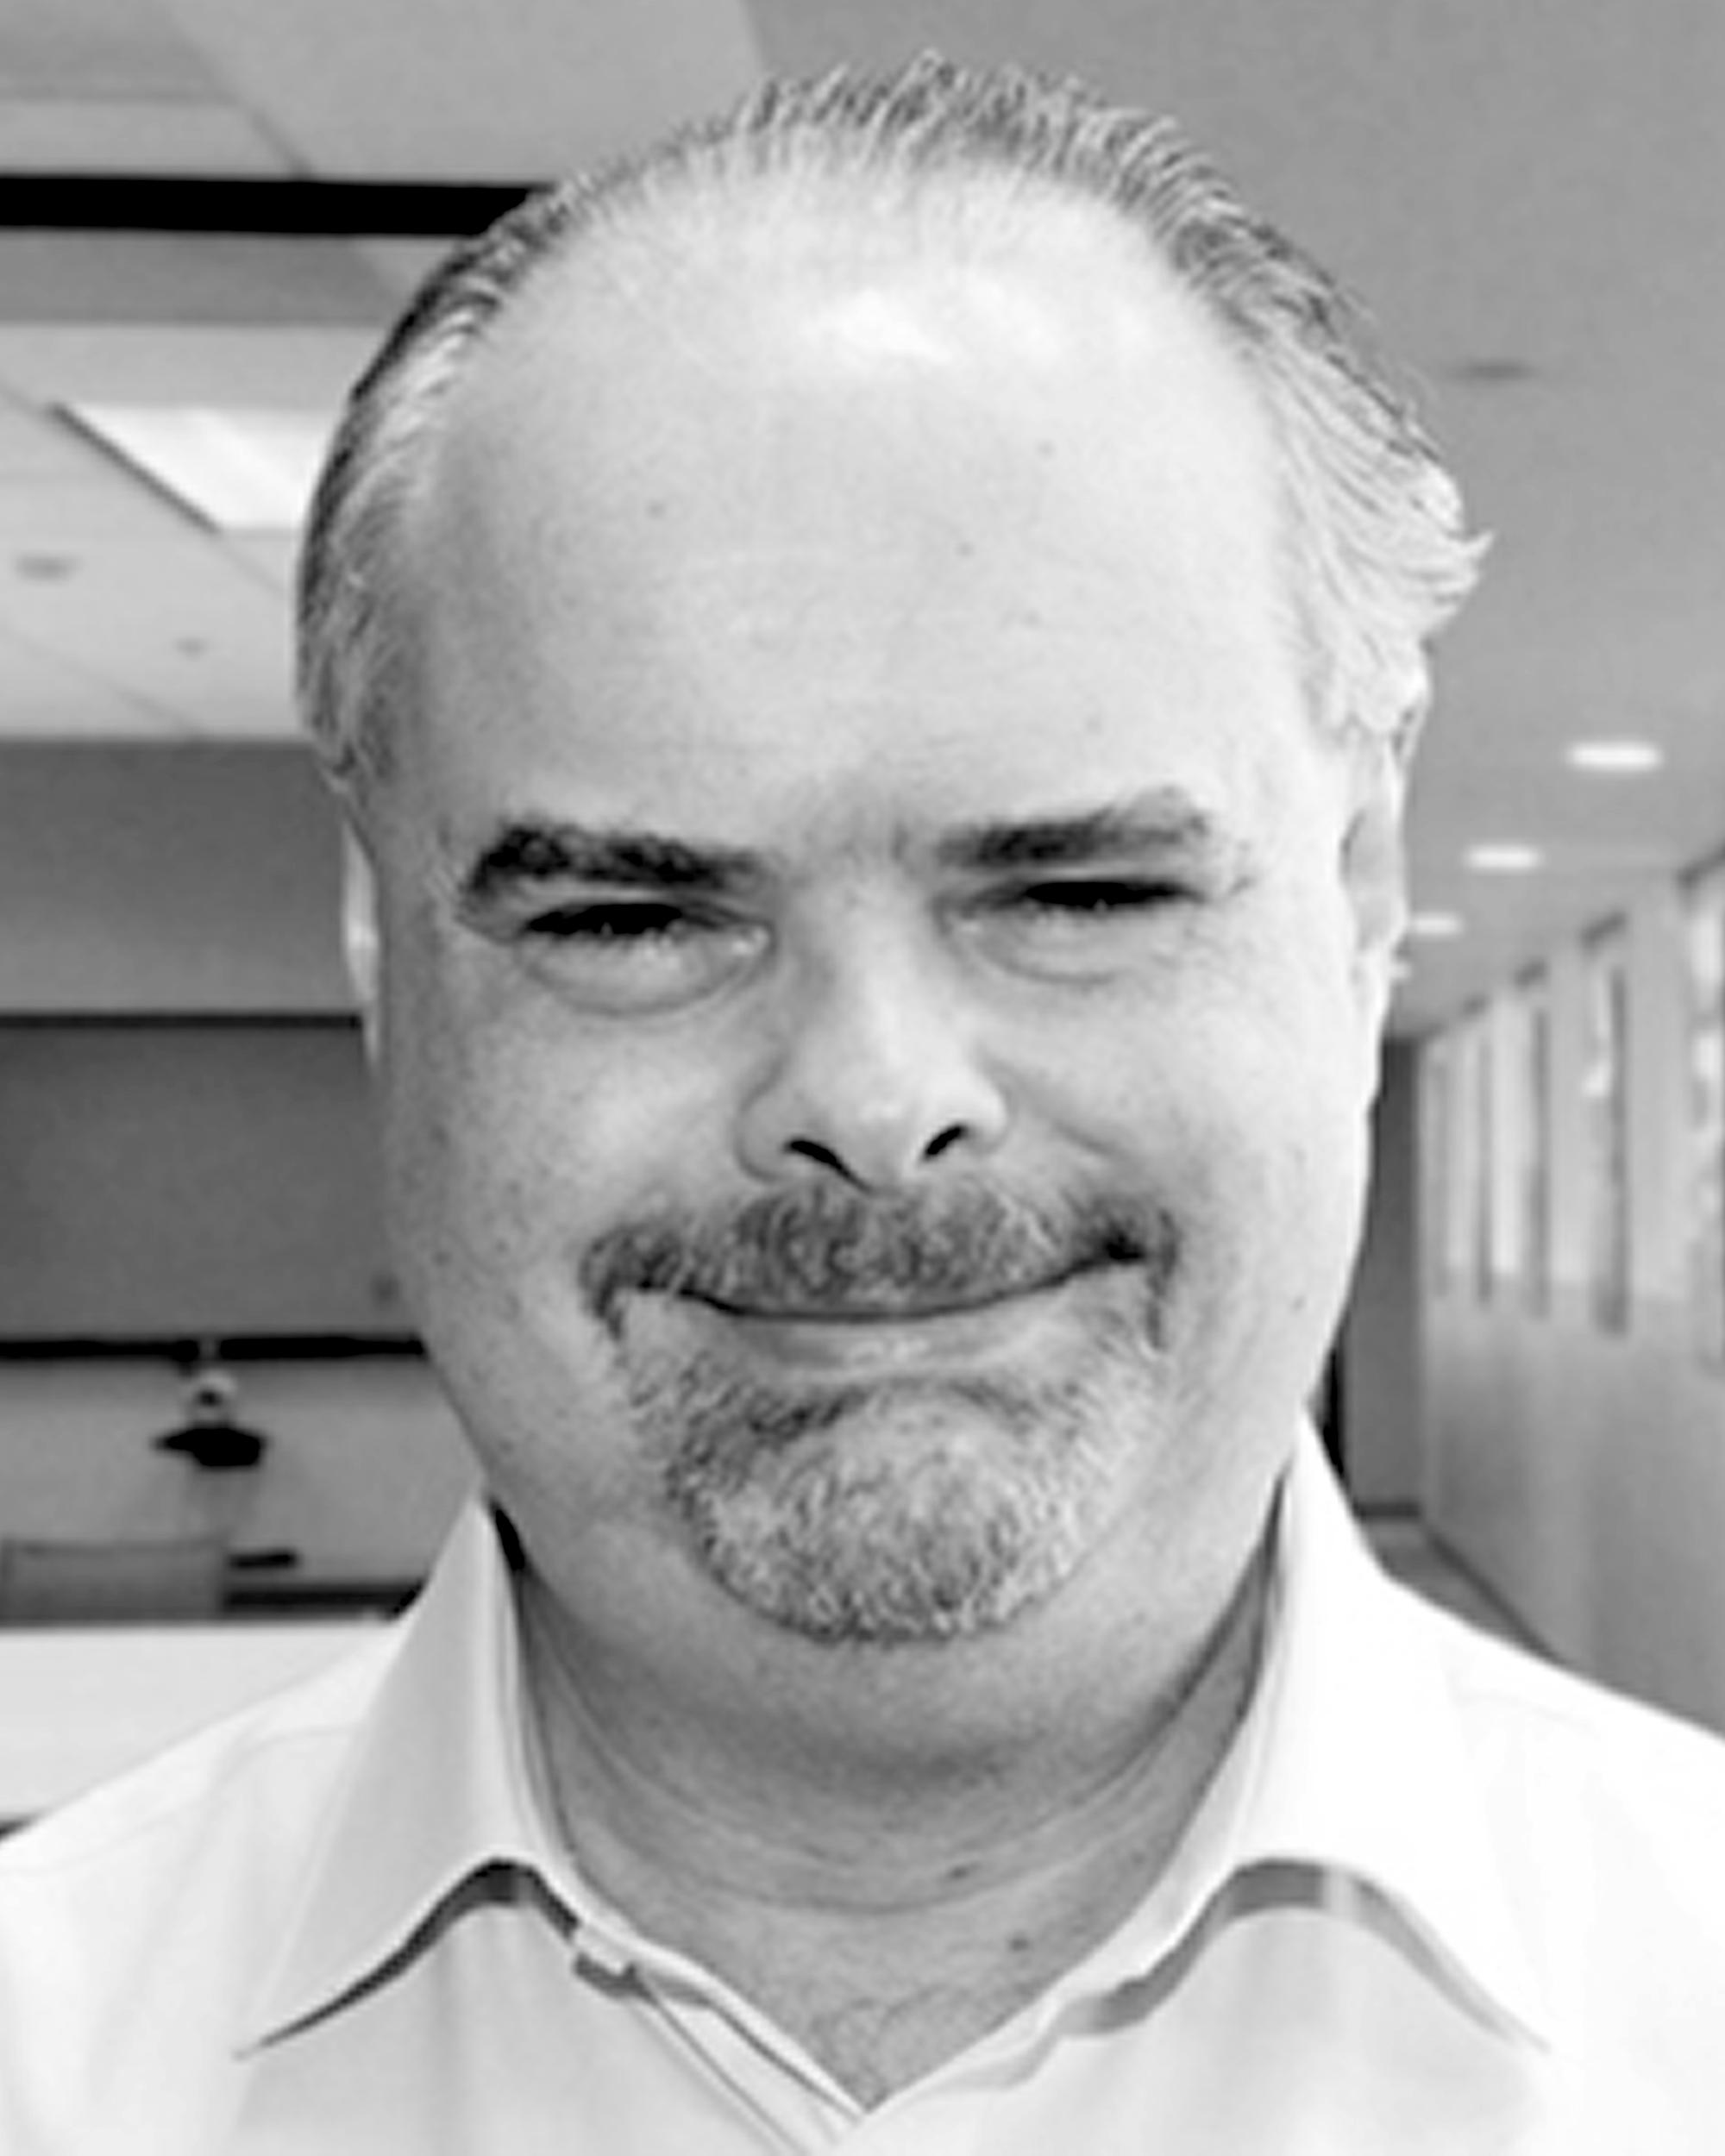 Headshot of Steve Schibuola